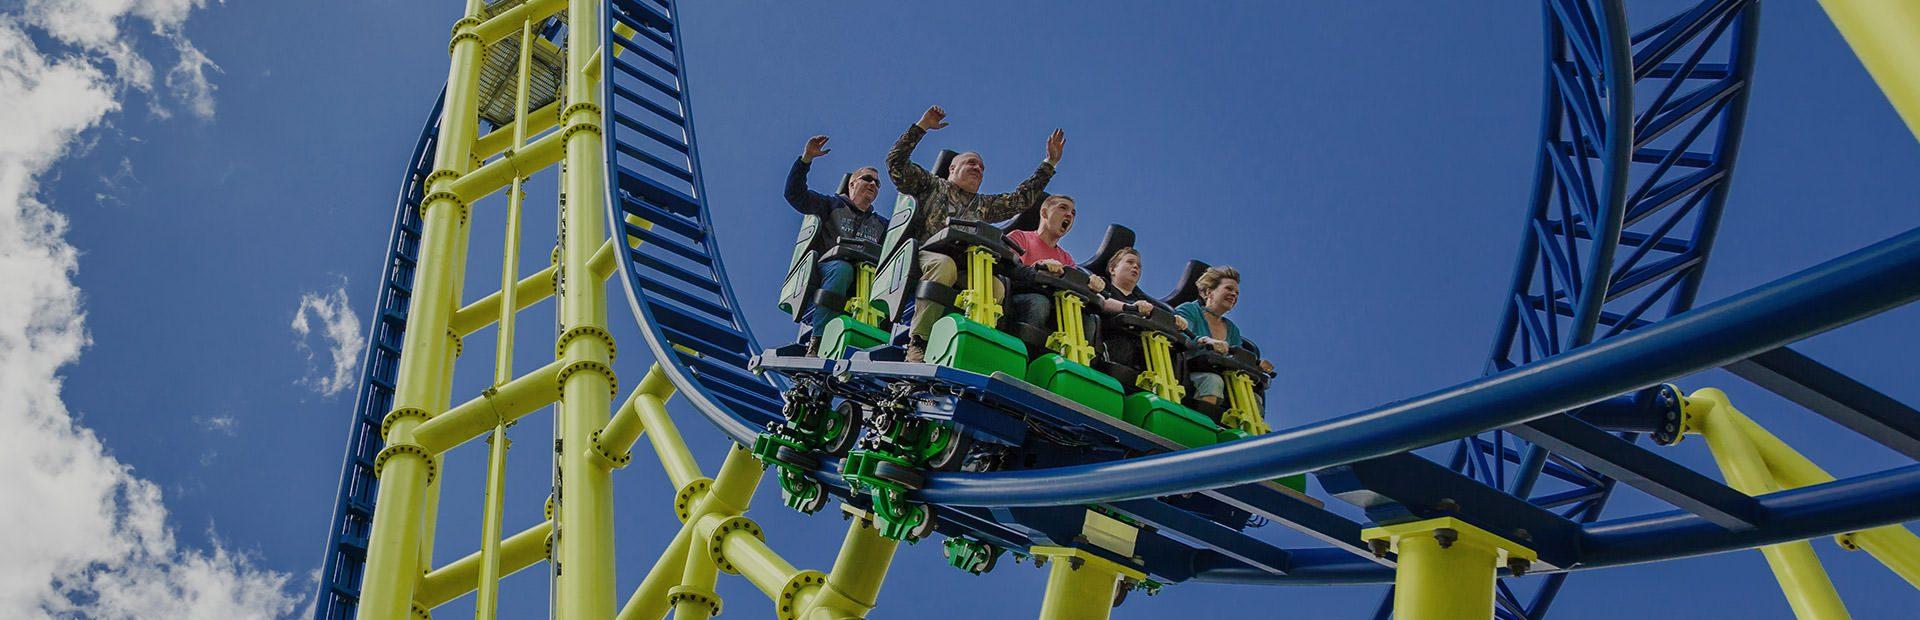 Knoebels Amusement Park Impulse 2 ride